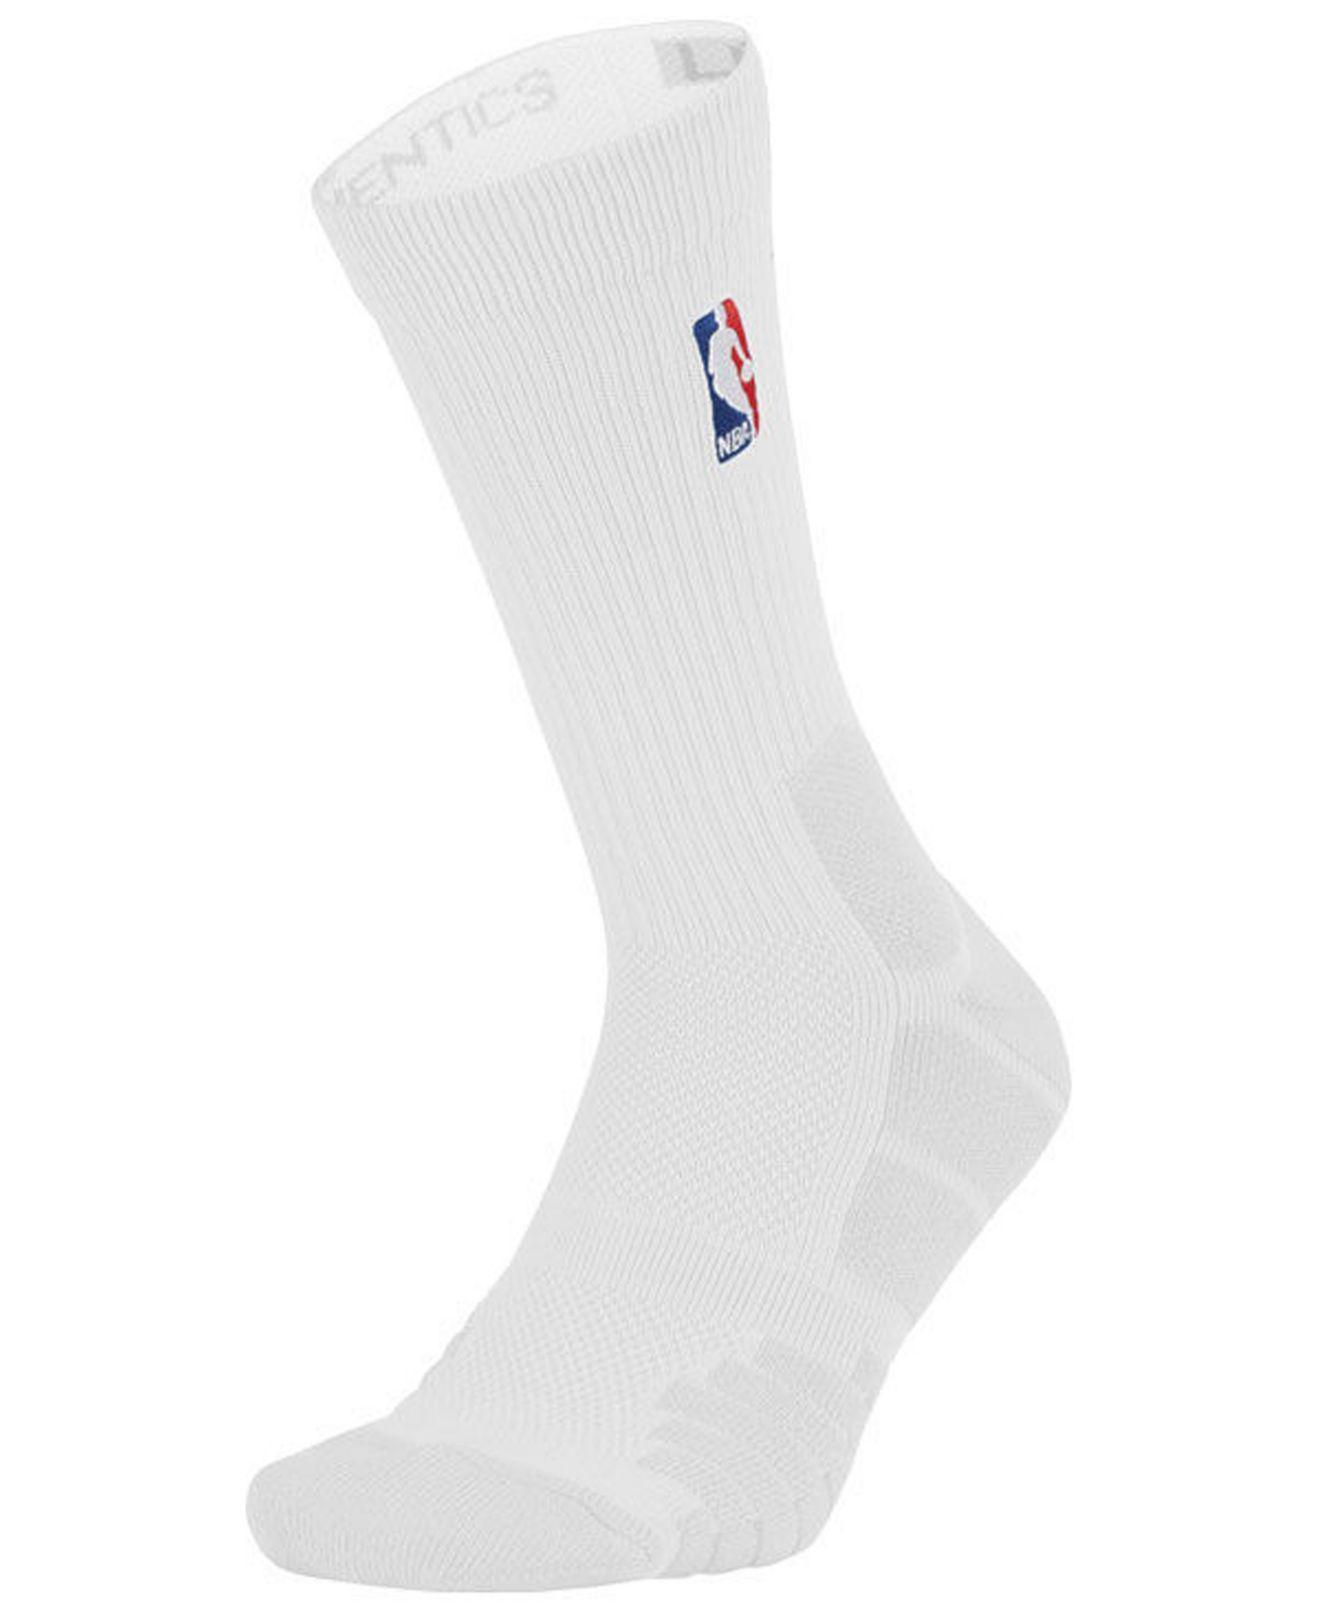 4abbdad1a64 Lyst - Nike Nba All Star Elite Quick Jordan Crew Socks in White for Men